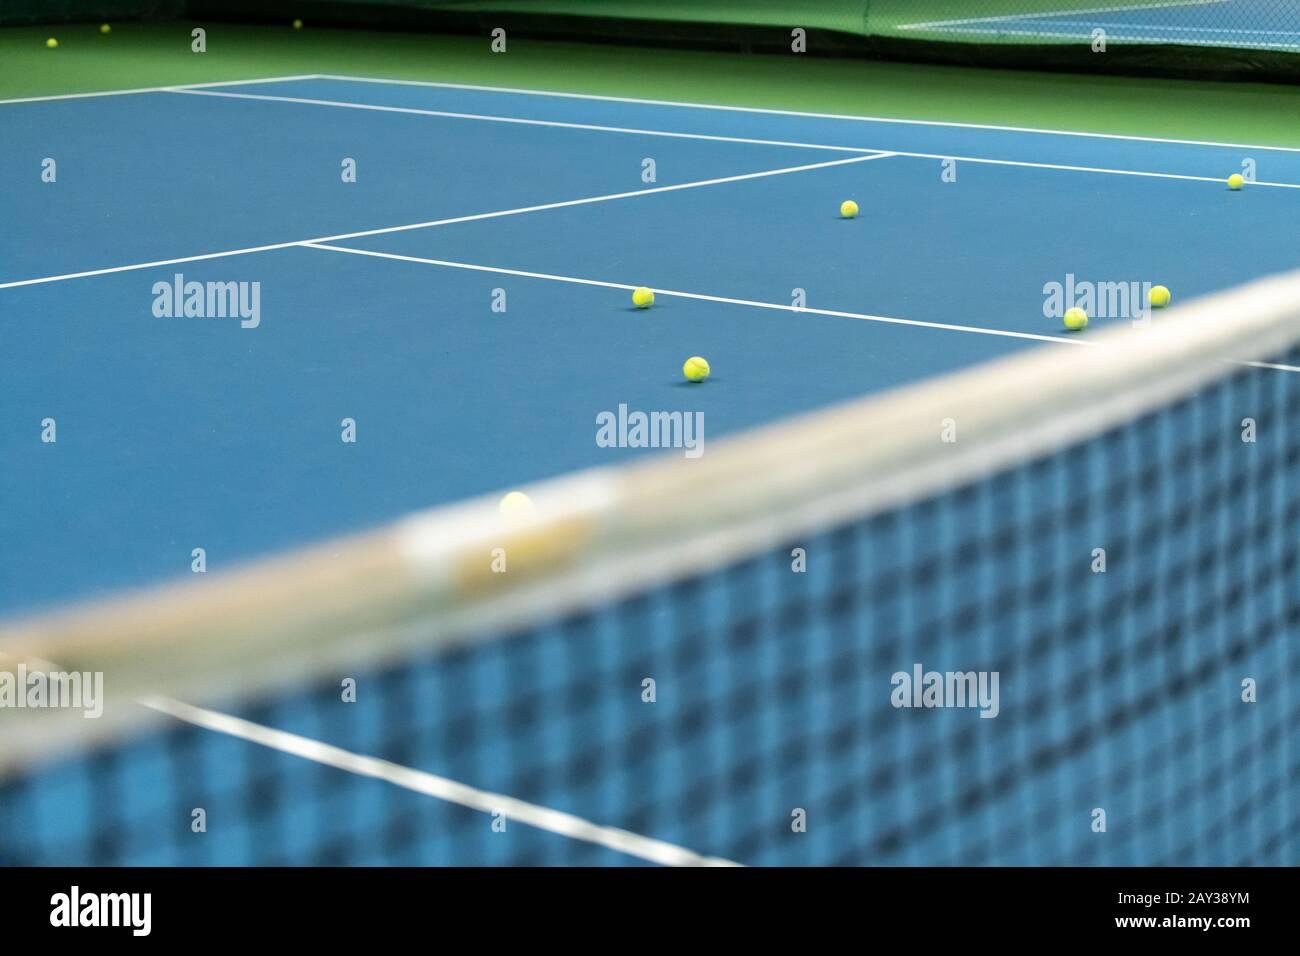 Tennis court with balls Stock Photo